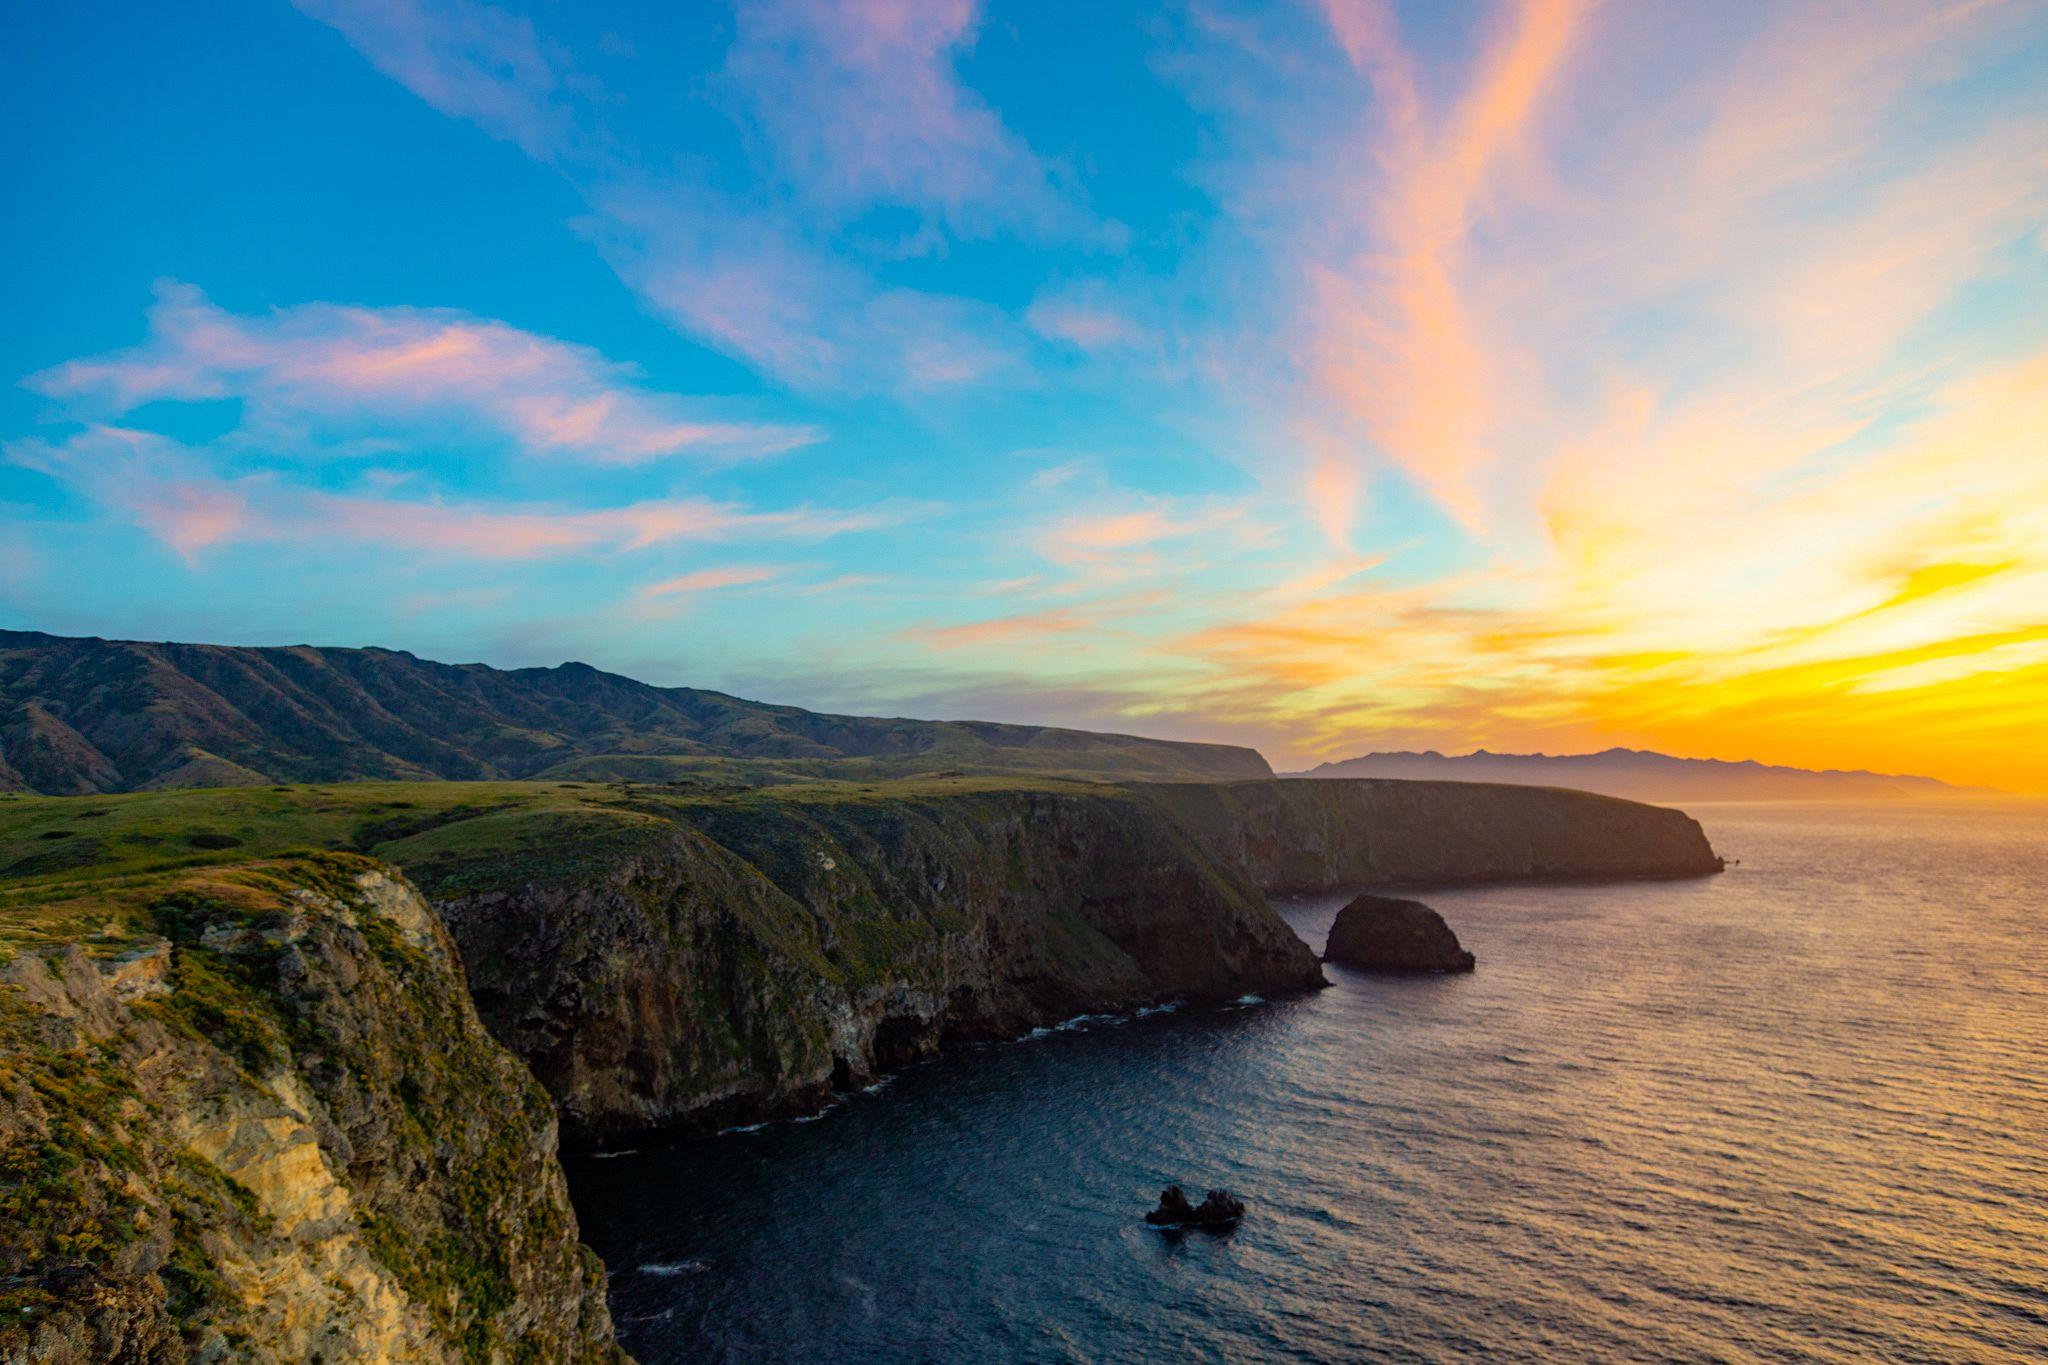 Sunset at Cavern Point